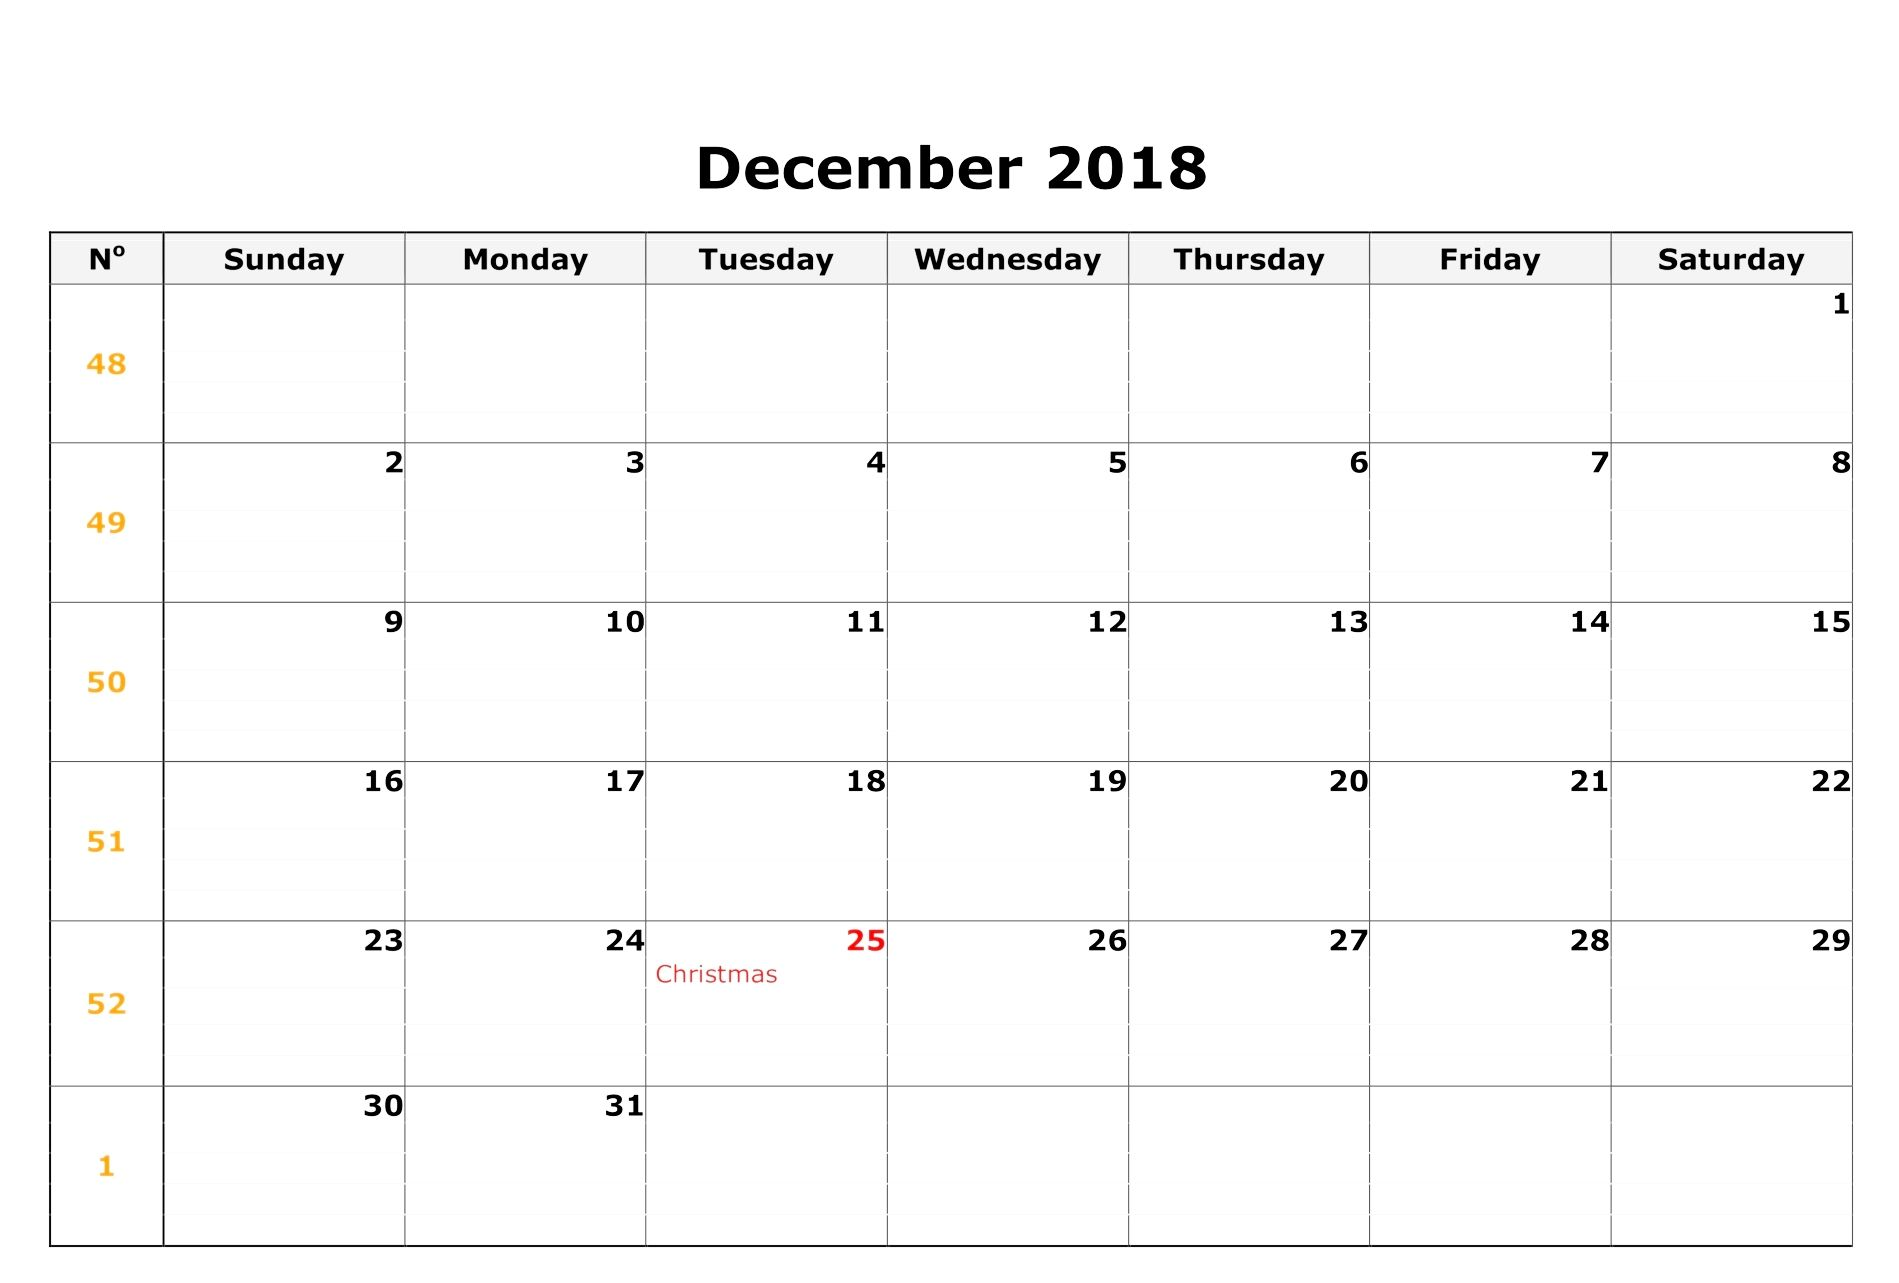 December 2018 Calendar Excel With Holidays Decembercalendar